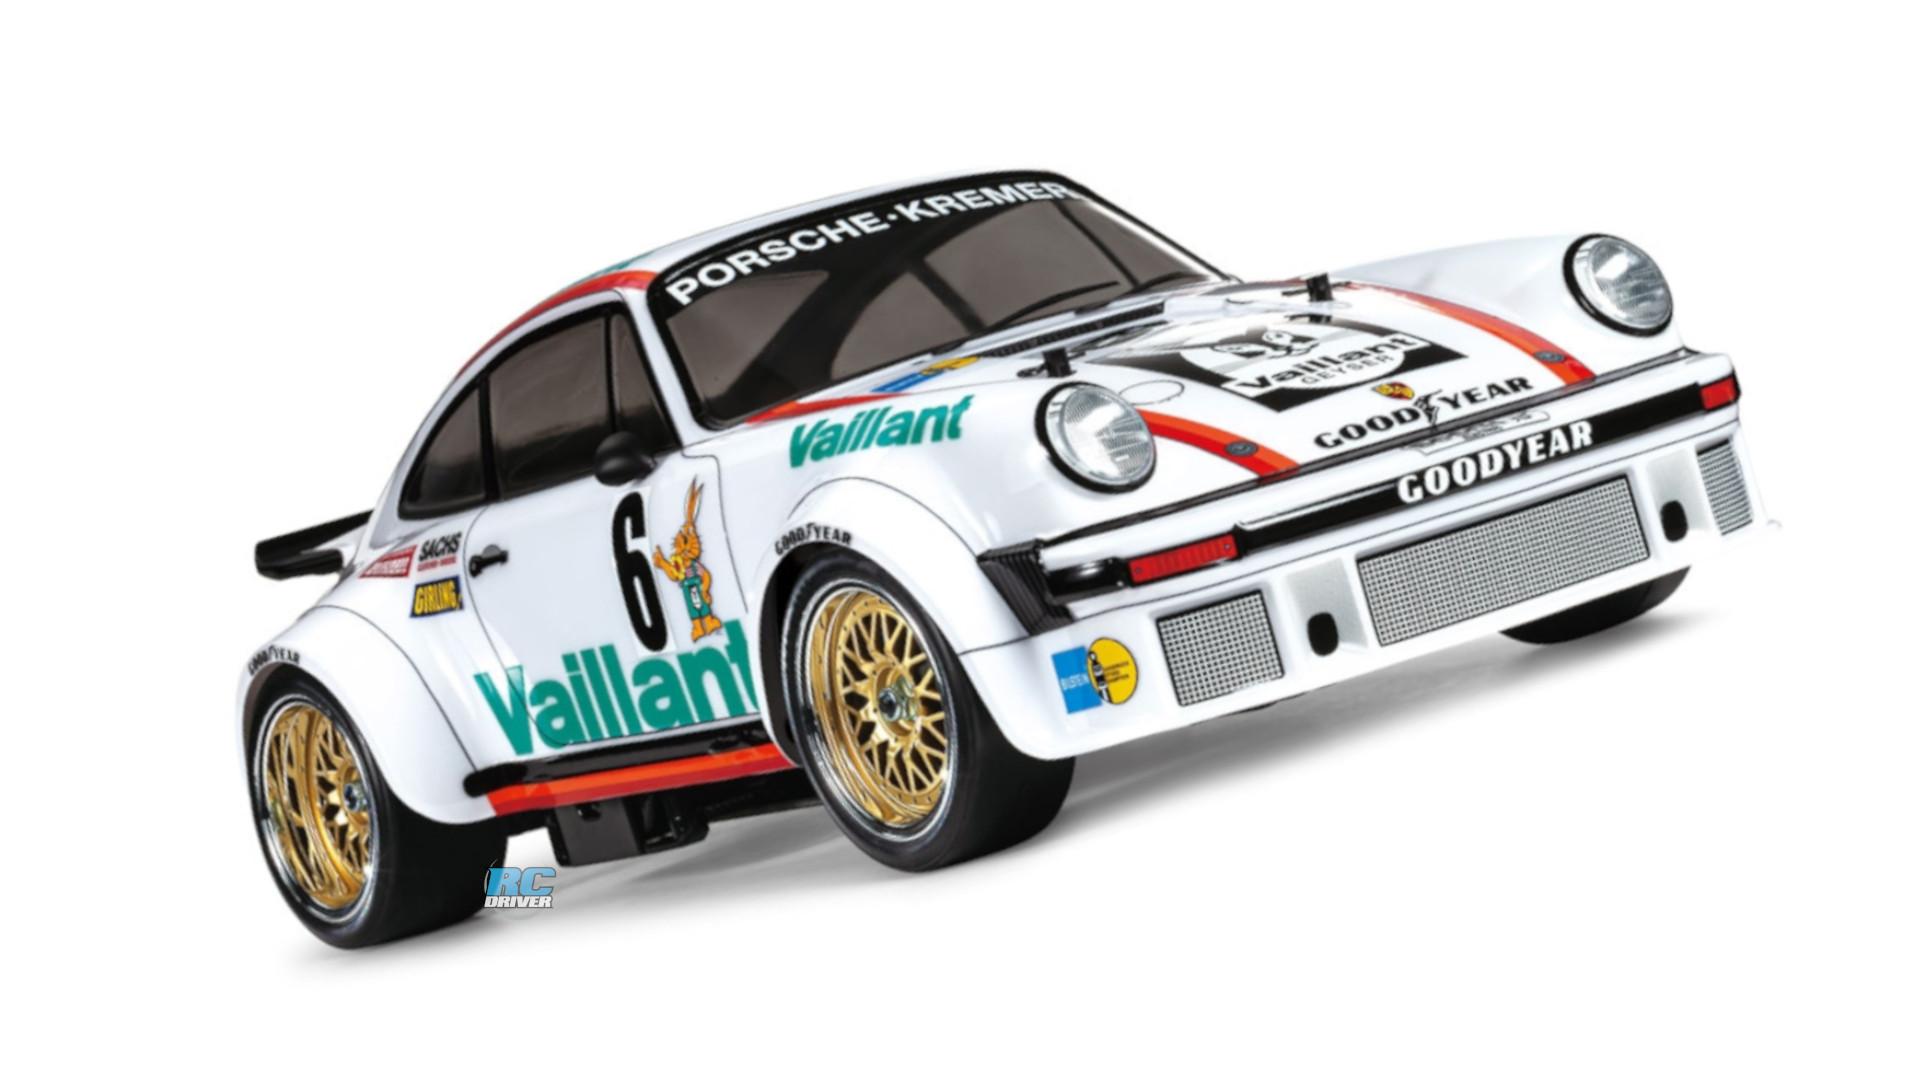 Tamiya 45th Anniversary Porsche 934 Coupe Vaillant